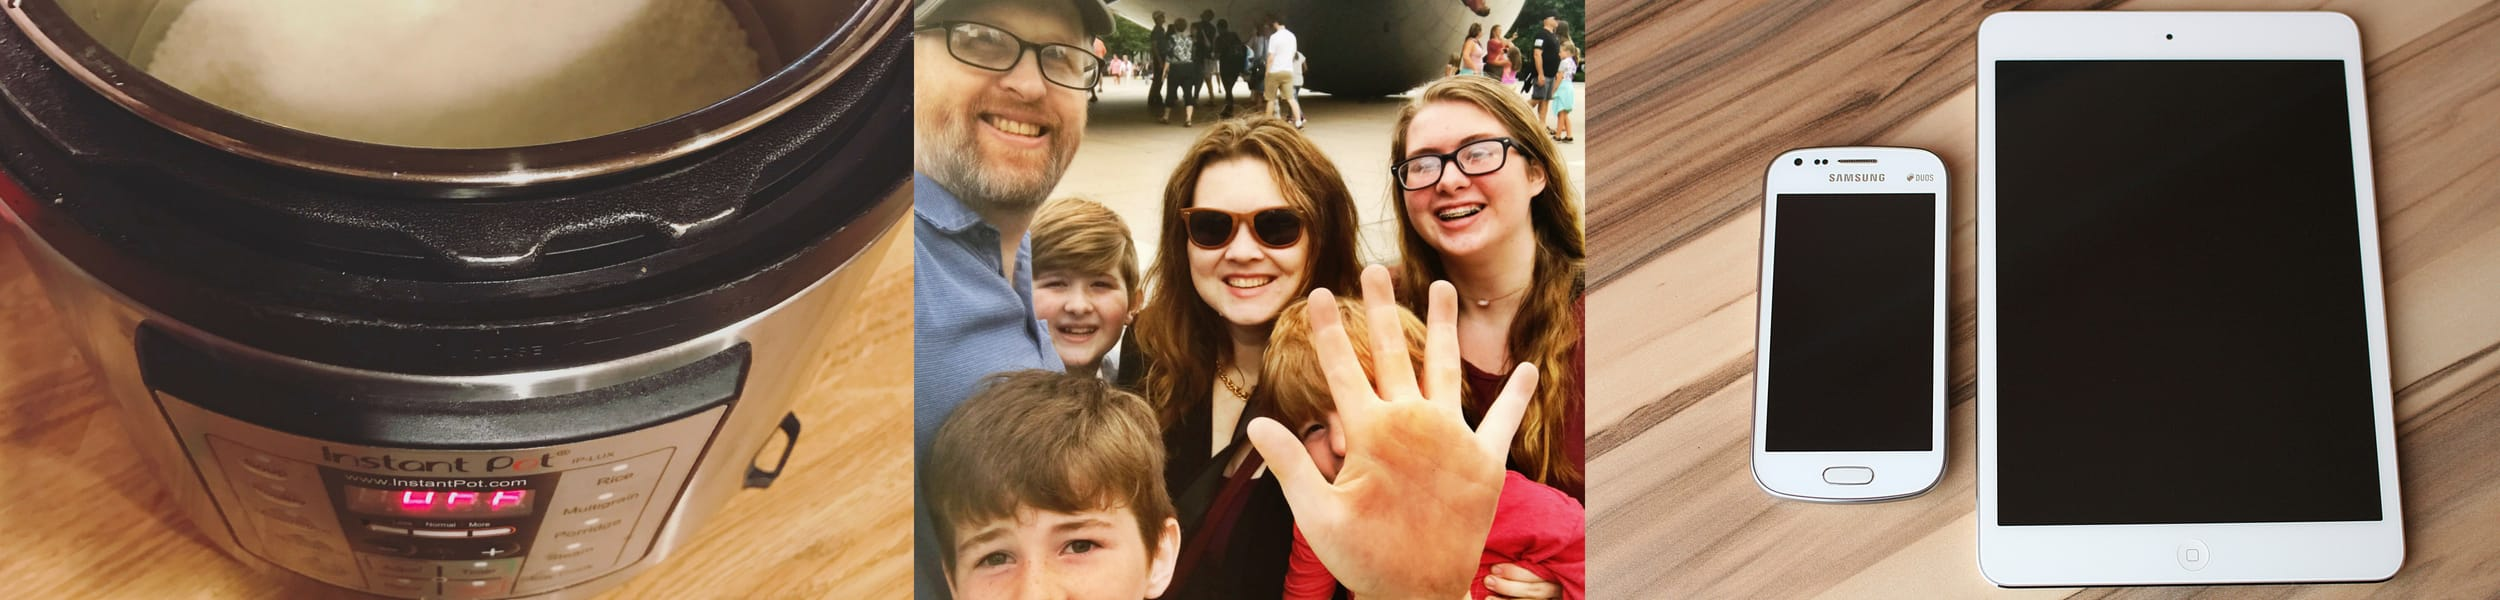 digital-lifestyle-family-blog-dallas